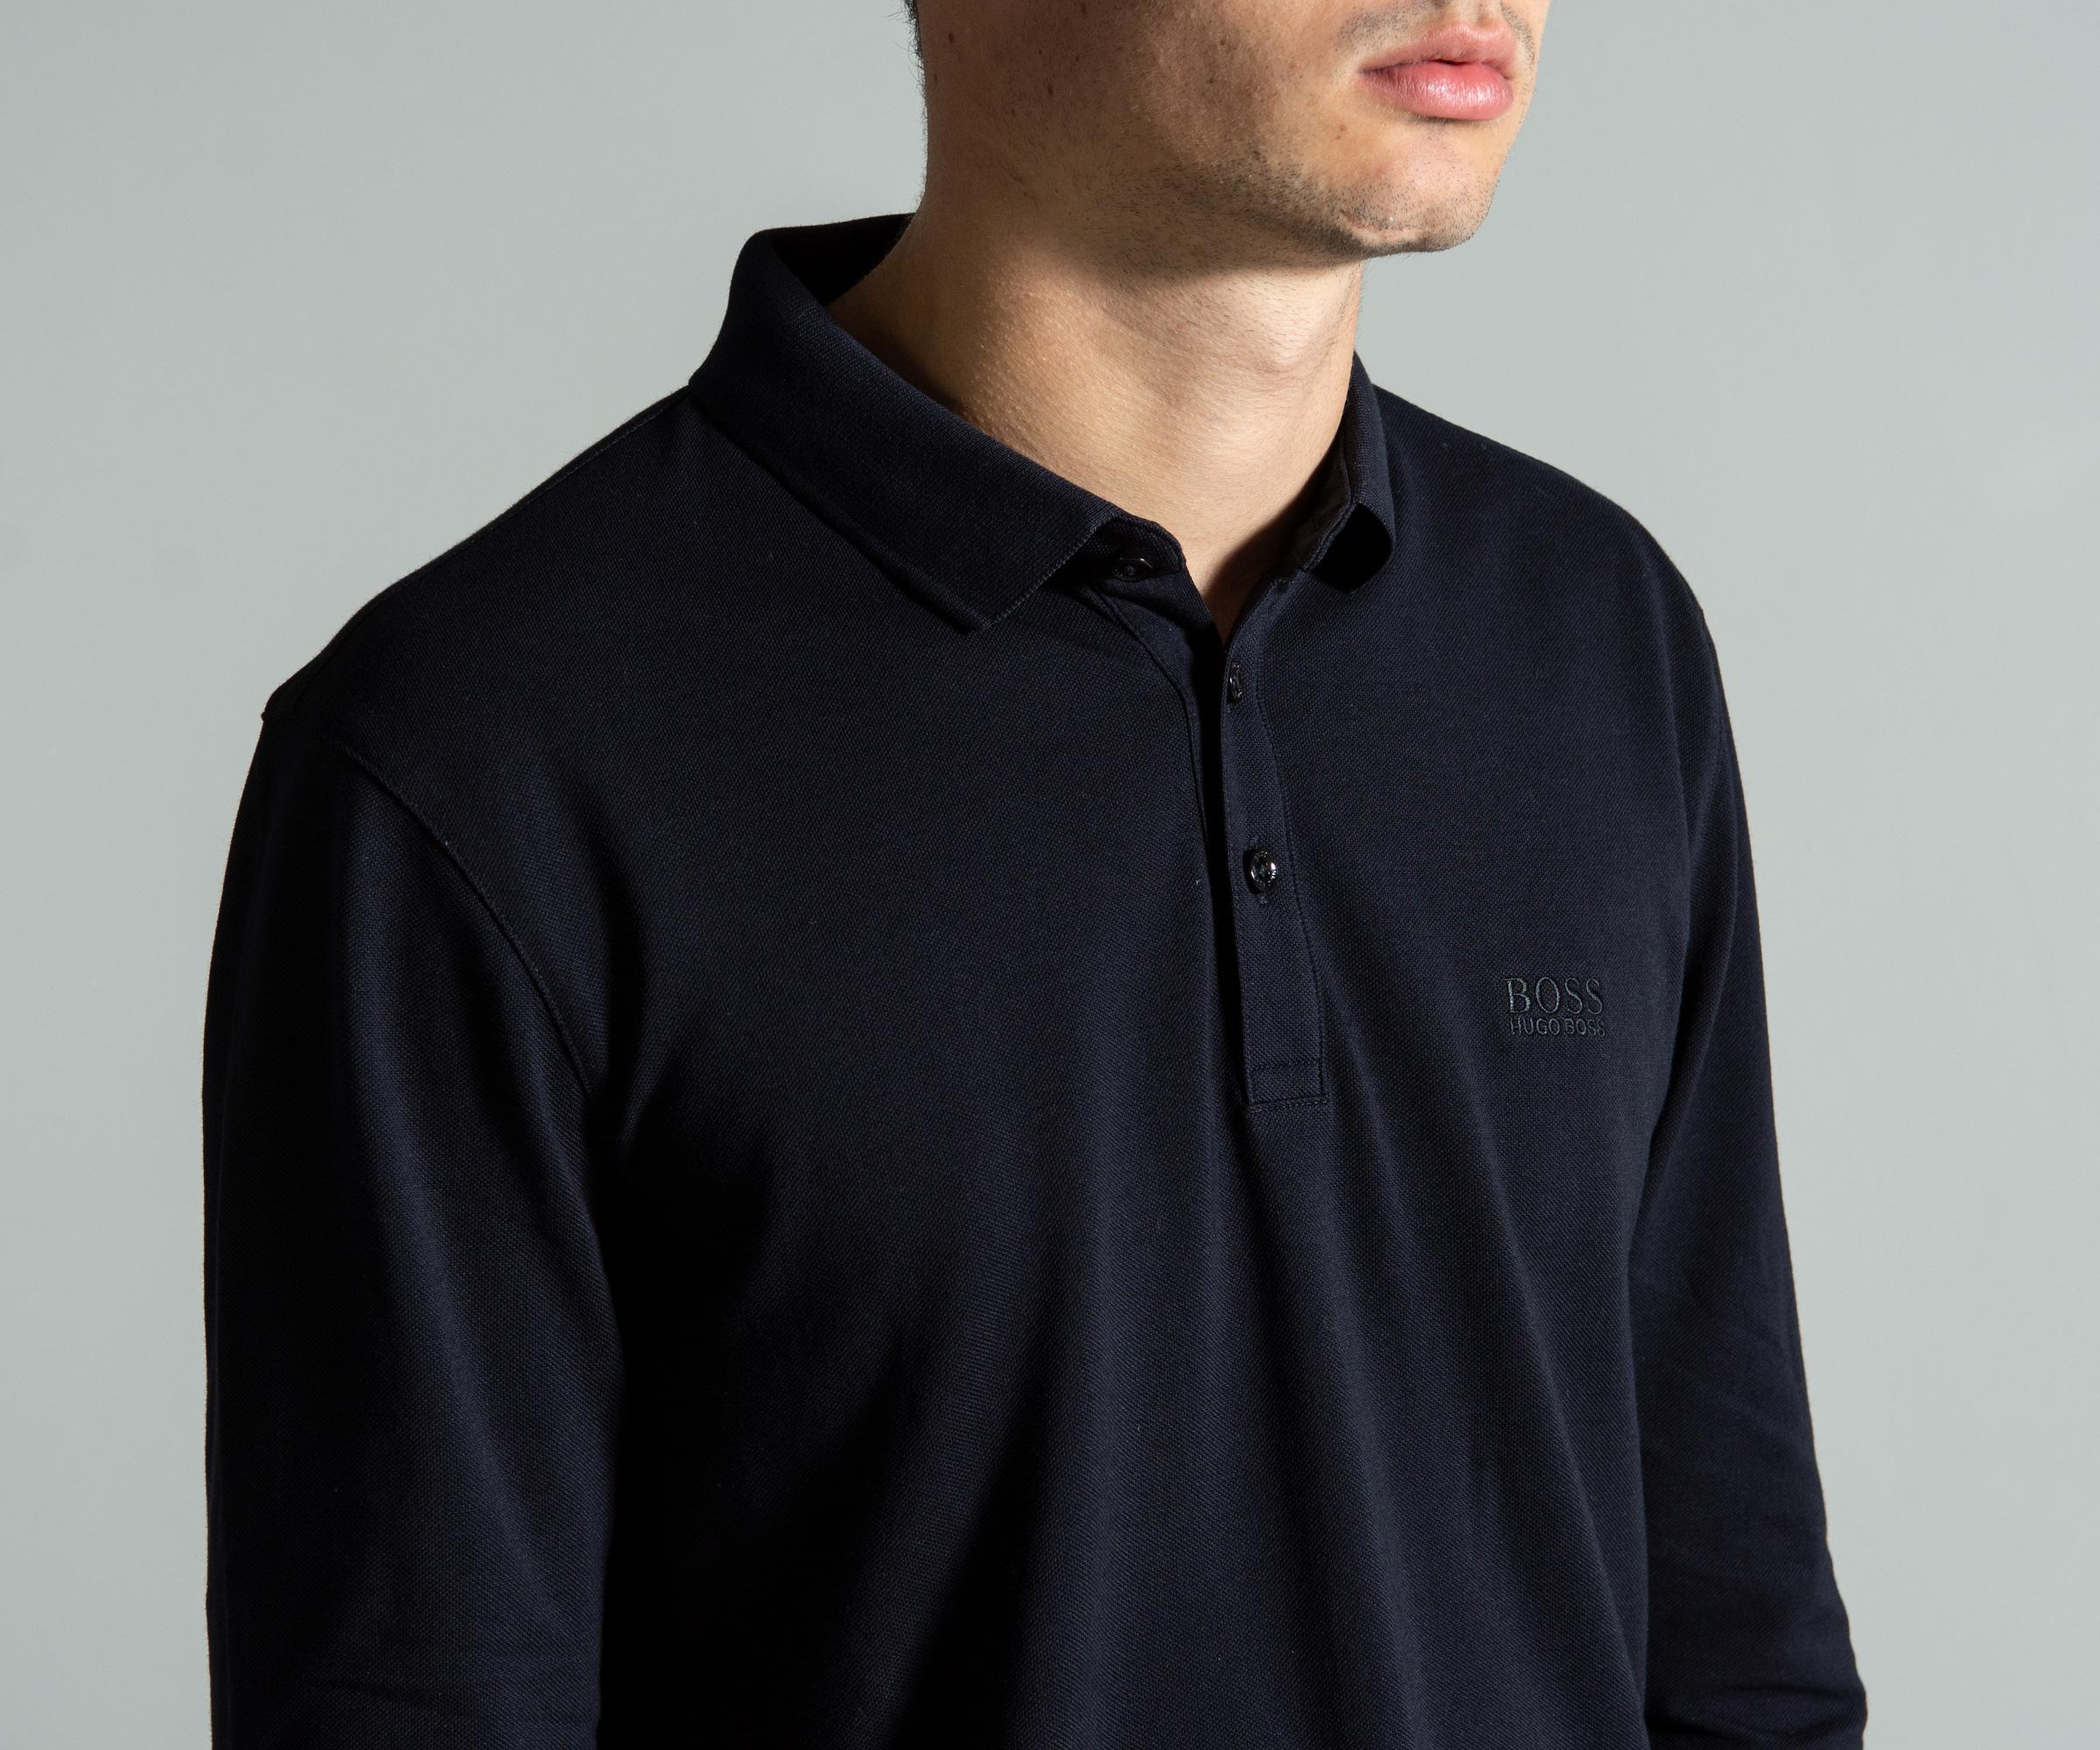 017e89c73 BOSS - Blue 'pado 10' Long Sleeved Interlock Cotton Polo Navy for Men -.  View fullscreen